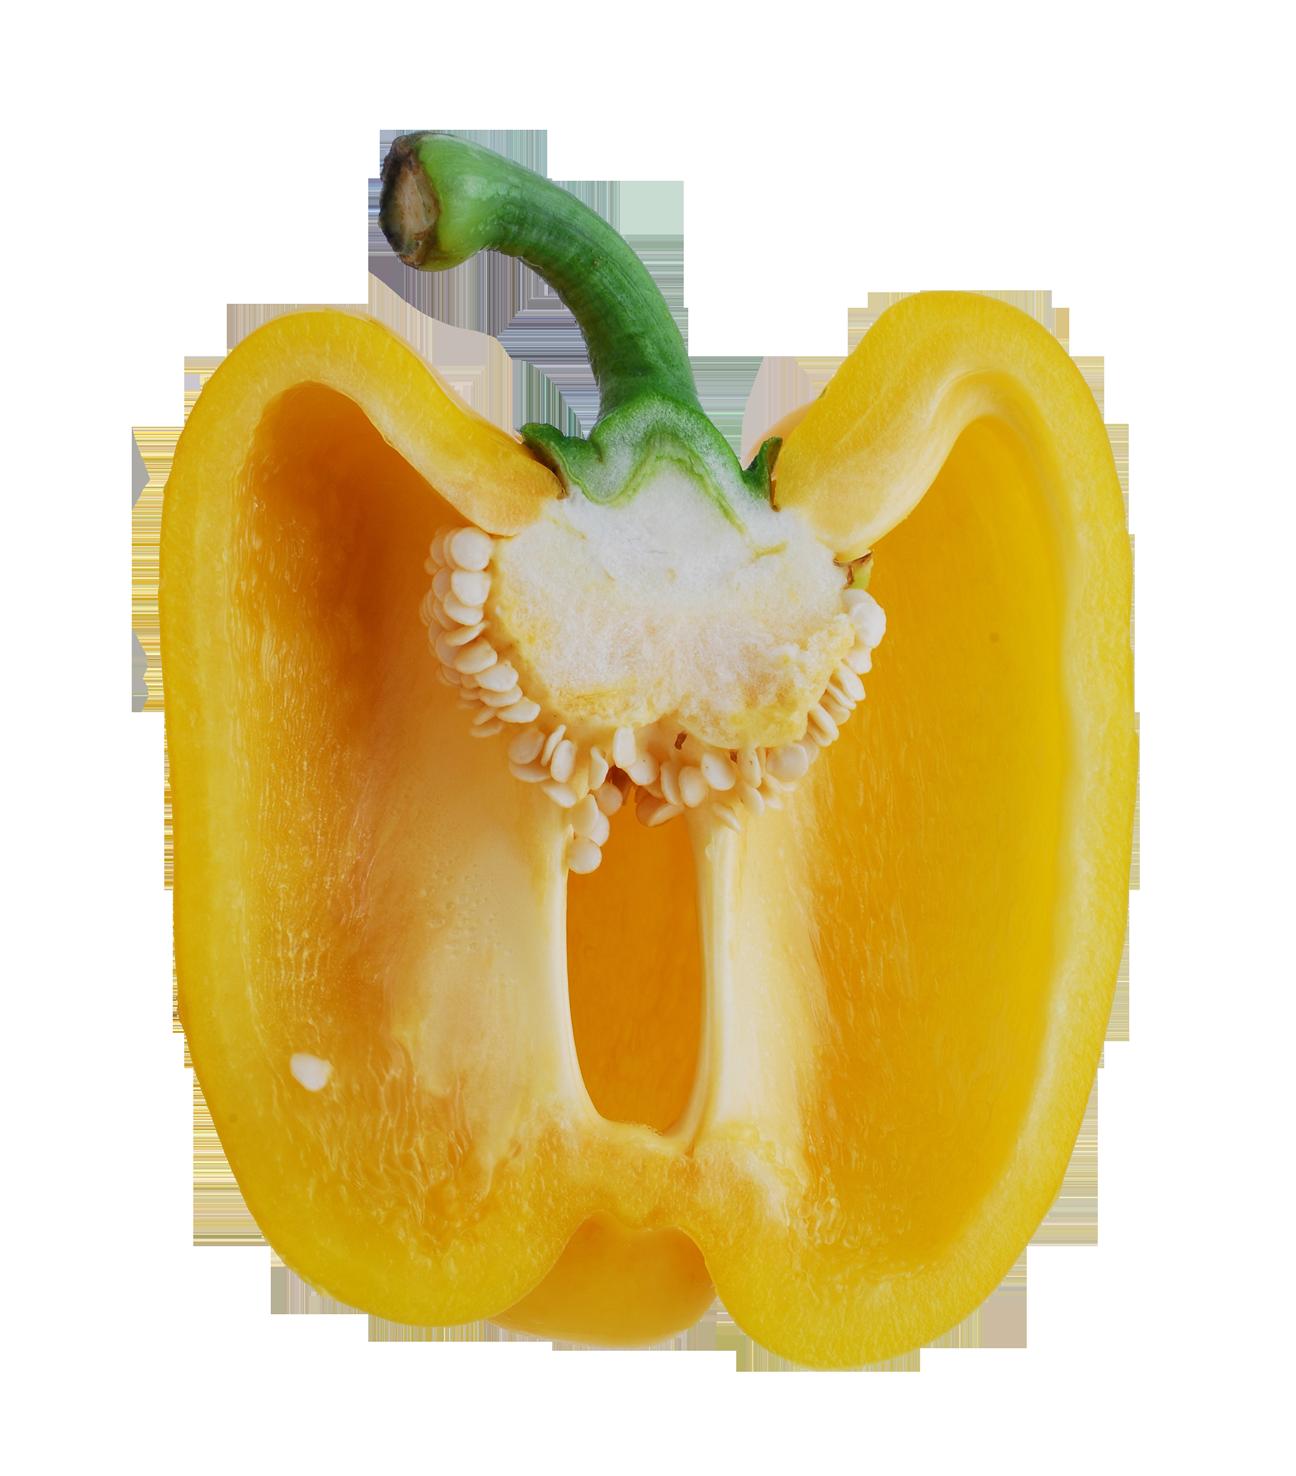 Bell Pepper Half PNG Image